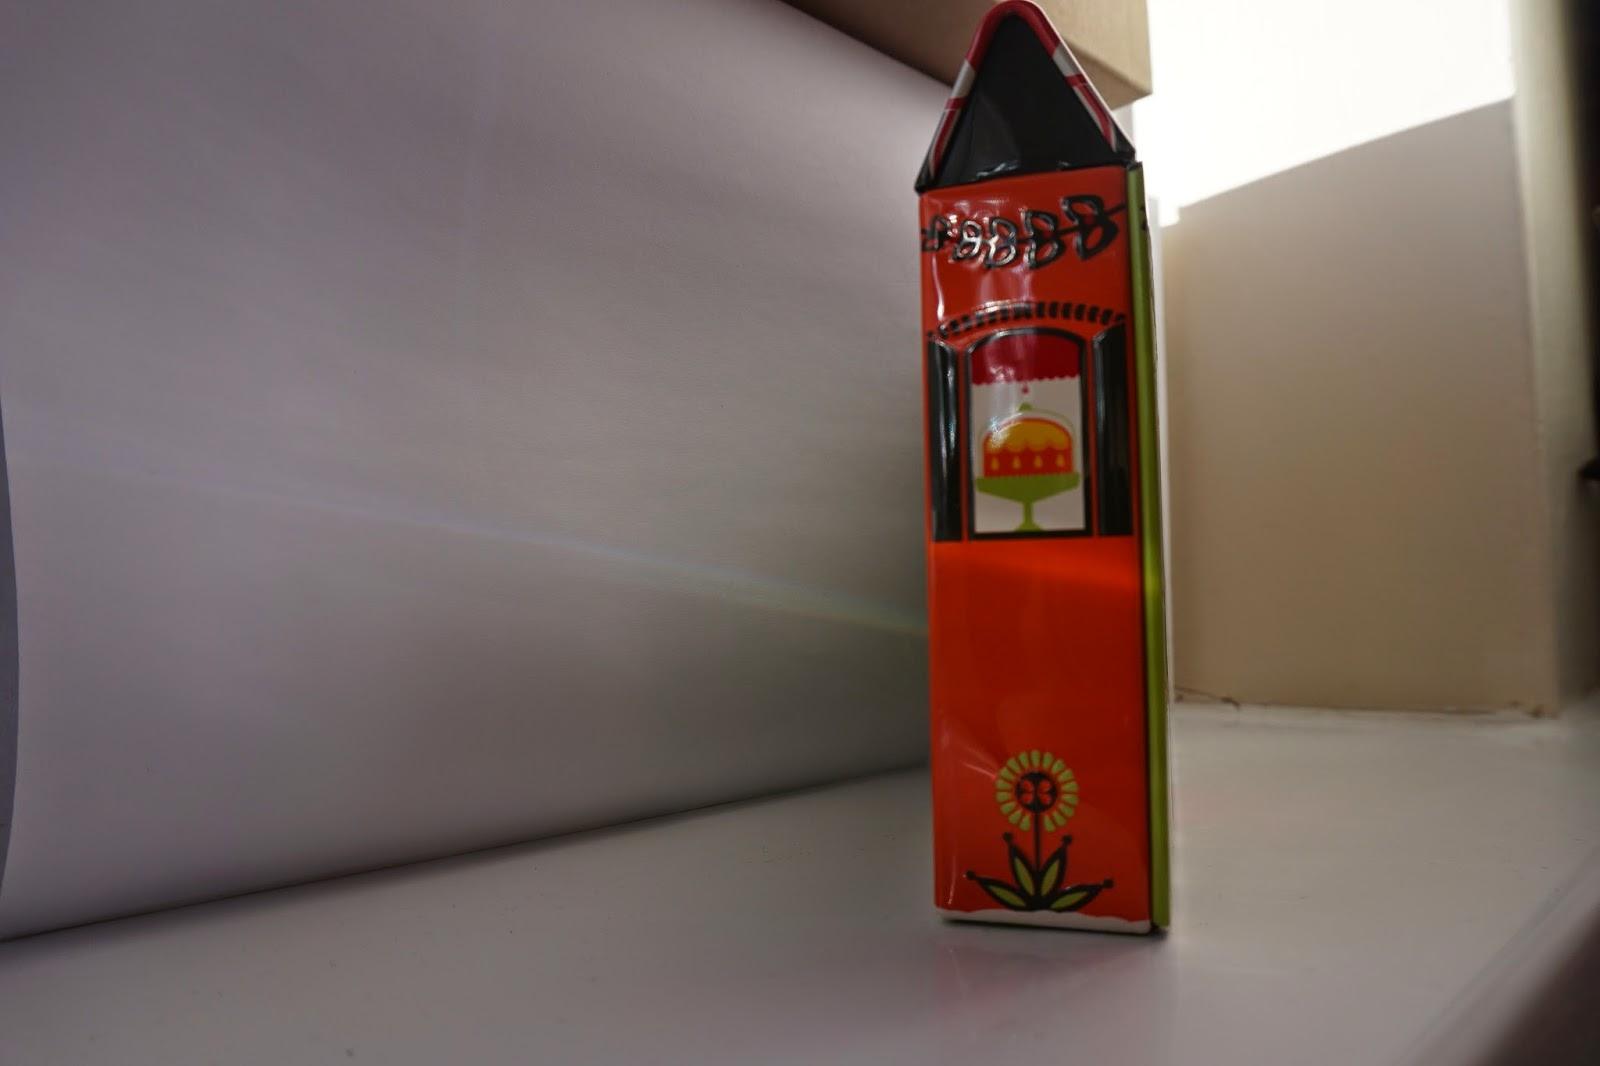 Should I Get It - Benefit Cheeky Sweet Spot - Dusty Foxes Beauty Blog